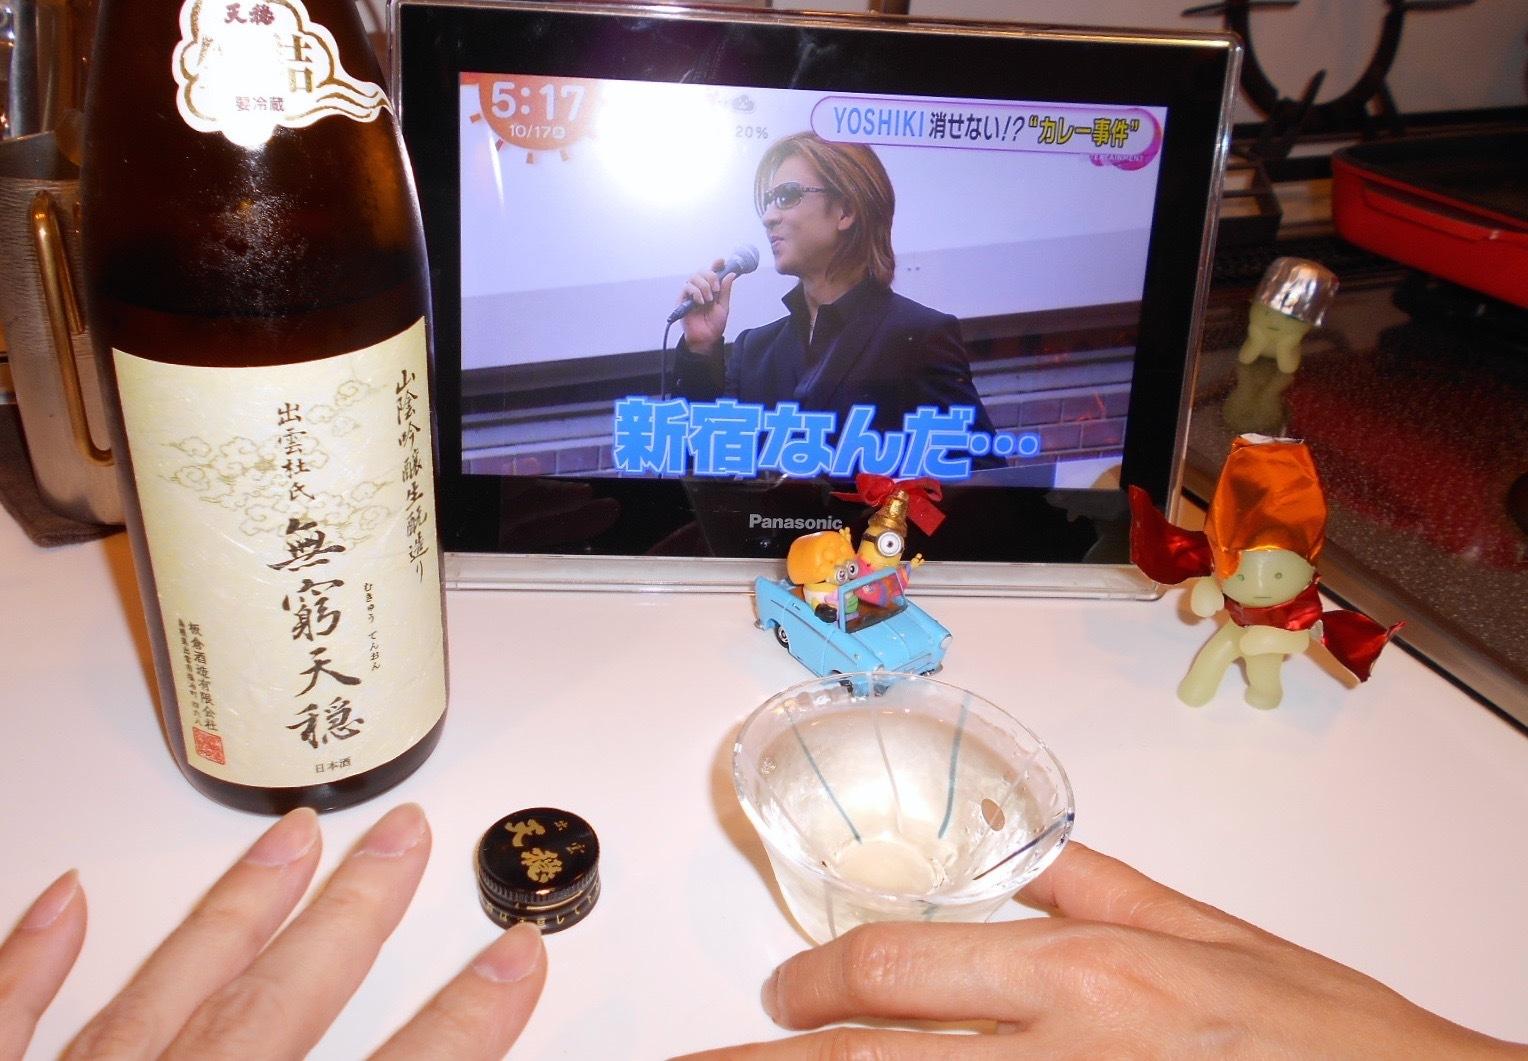 mukyutenon_hiyaoroshi30by6.jpg